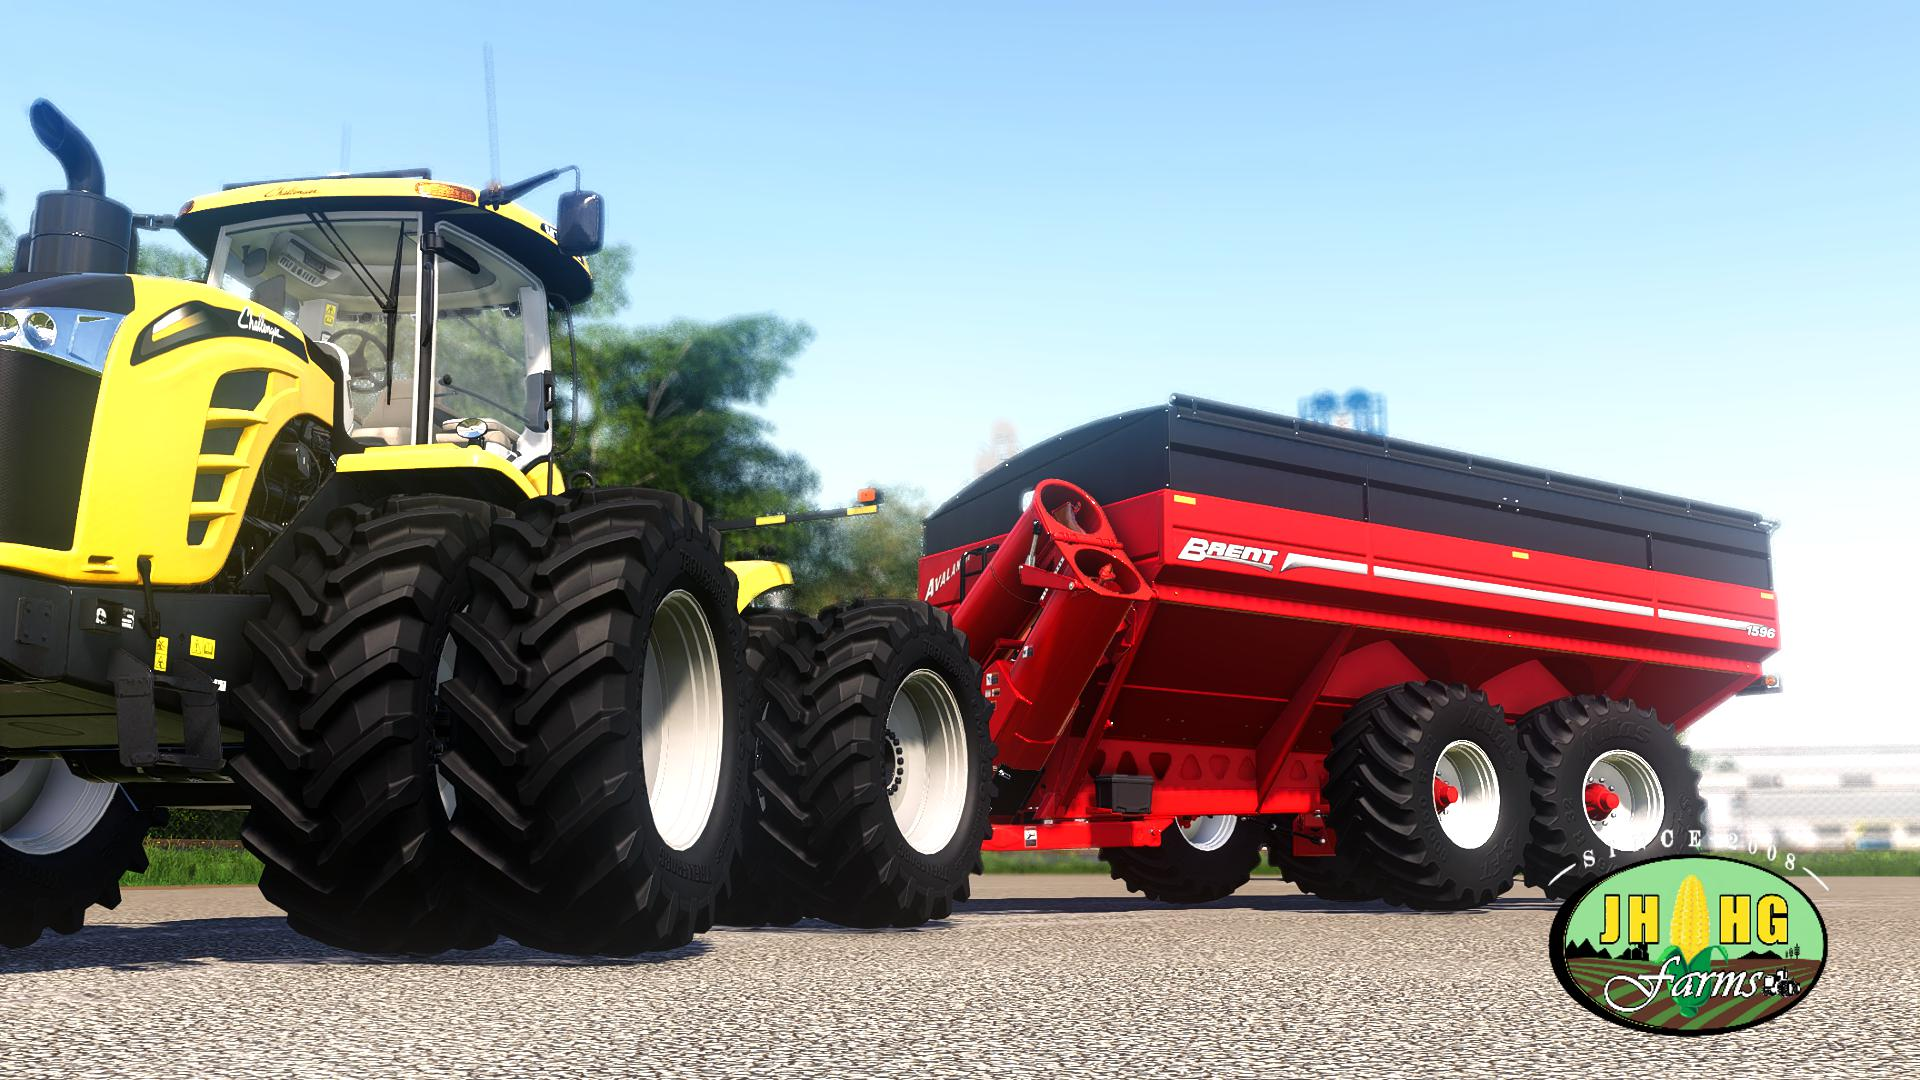 Brent Avalanche 1596 Grain Carts V2.0 FS 19